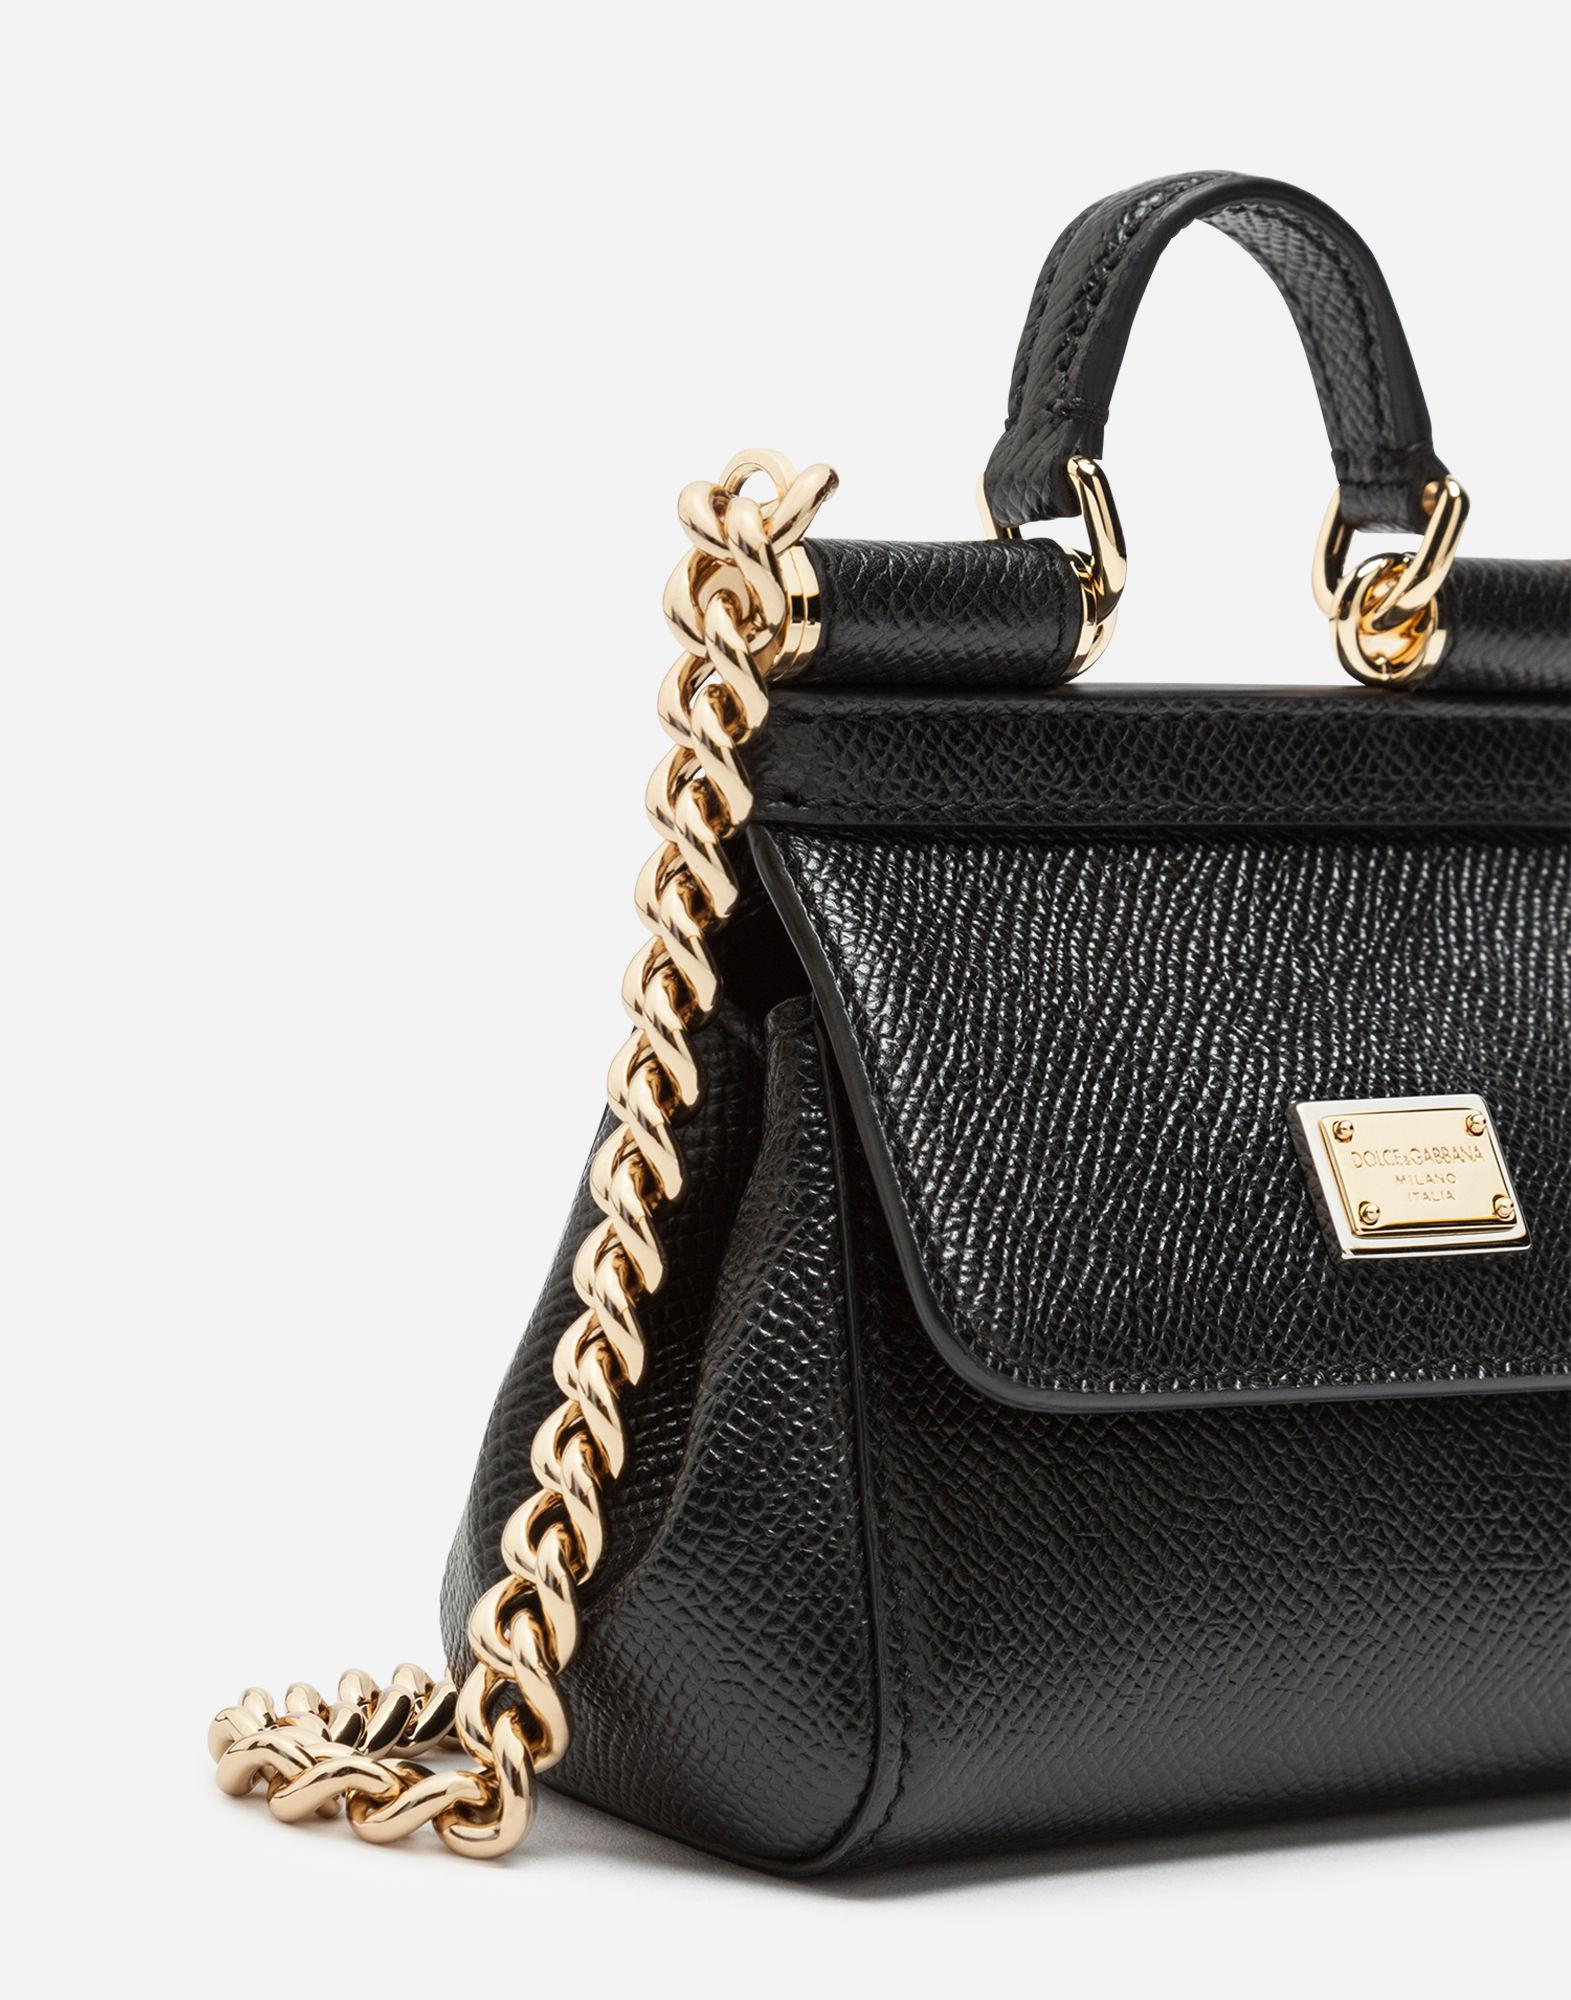 Lyst - Dolce   Gabbana Sicily Handbag In Printed Dauphine Calfskin in Black 3f674e610bdce